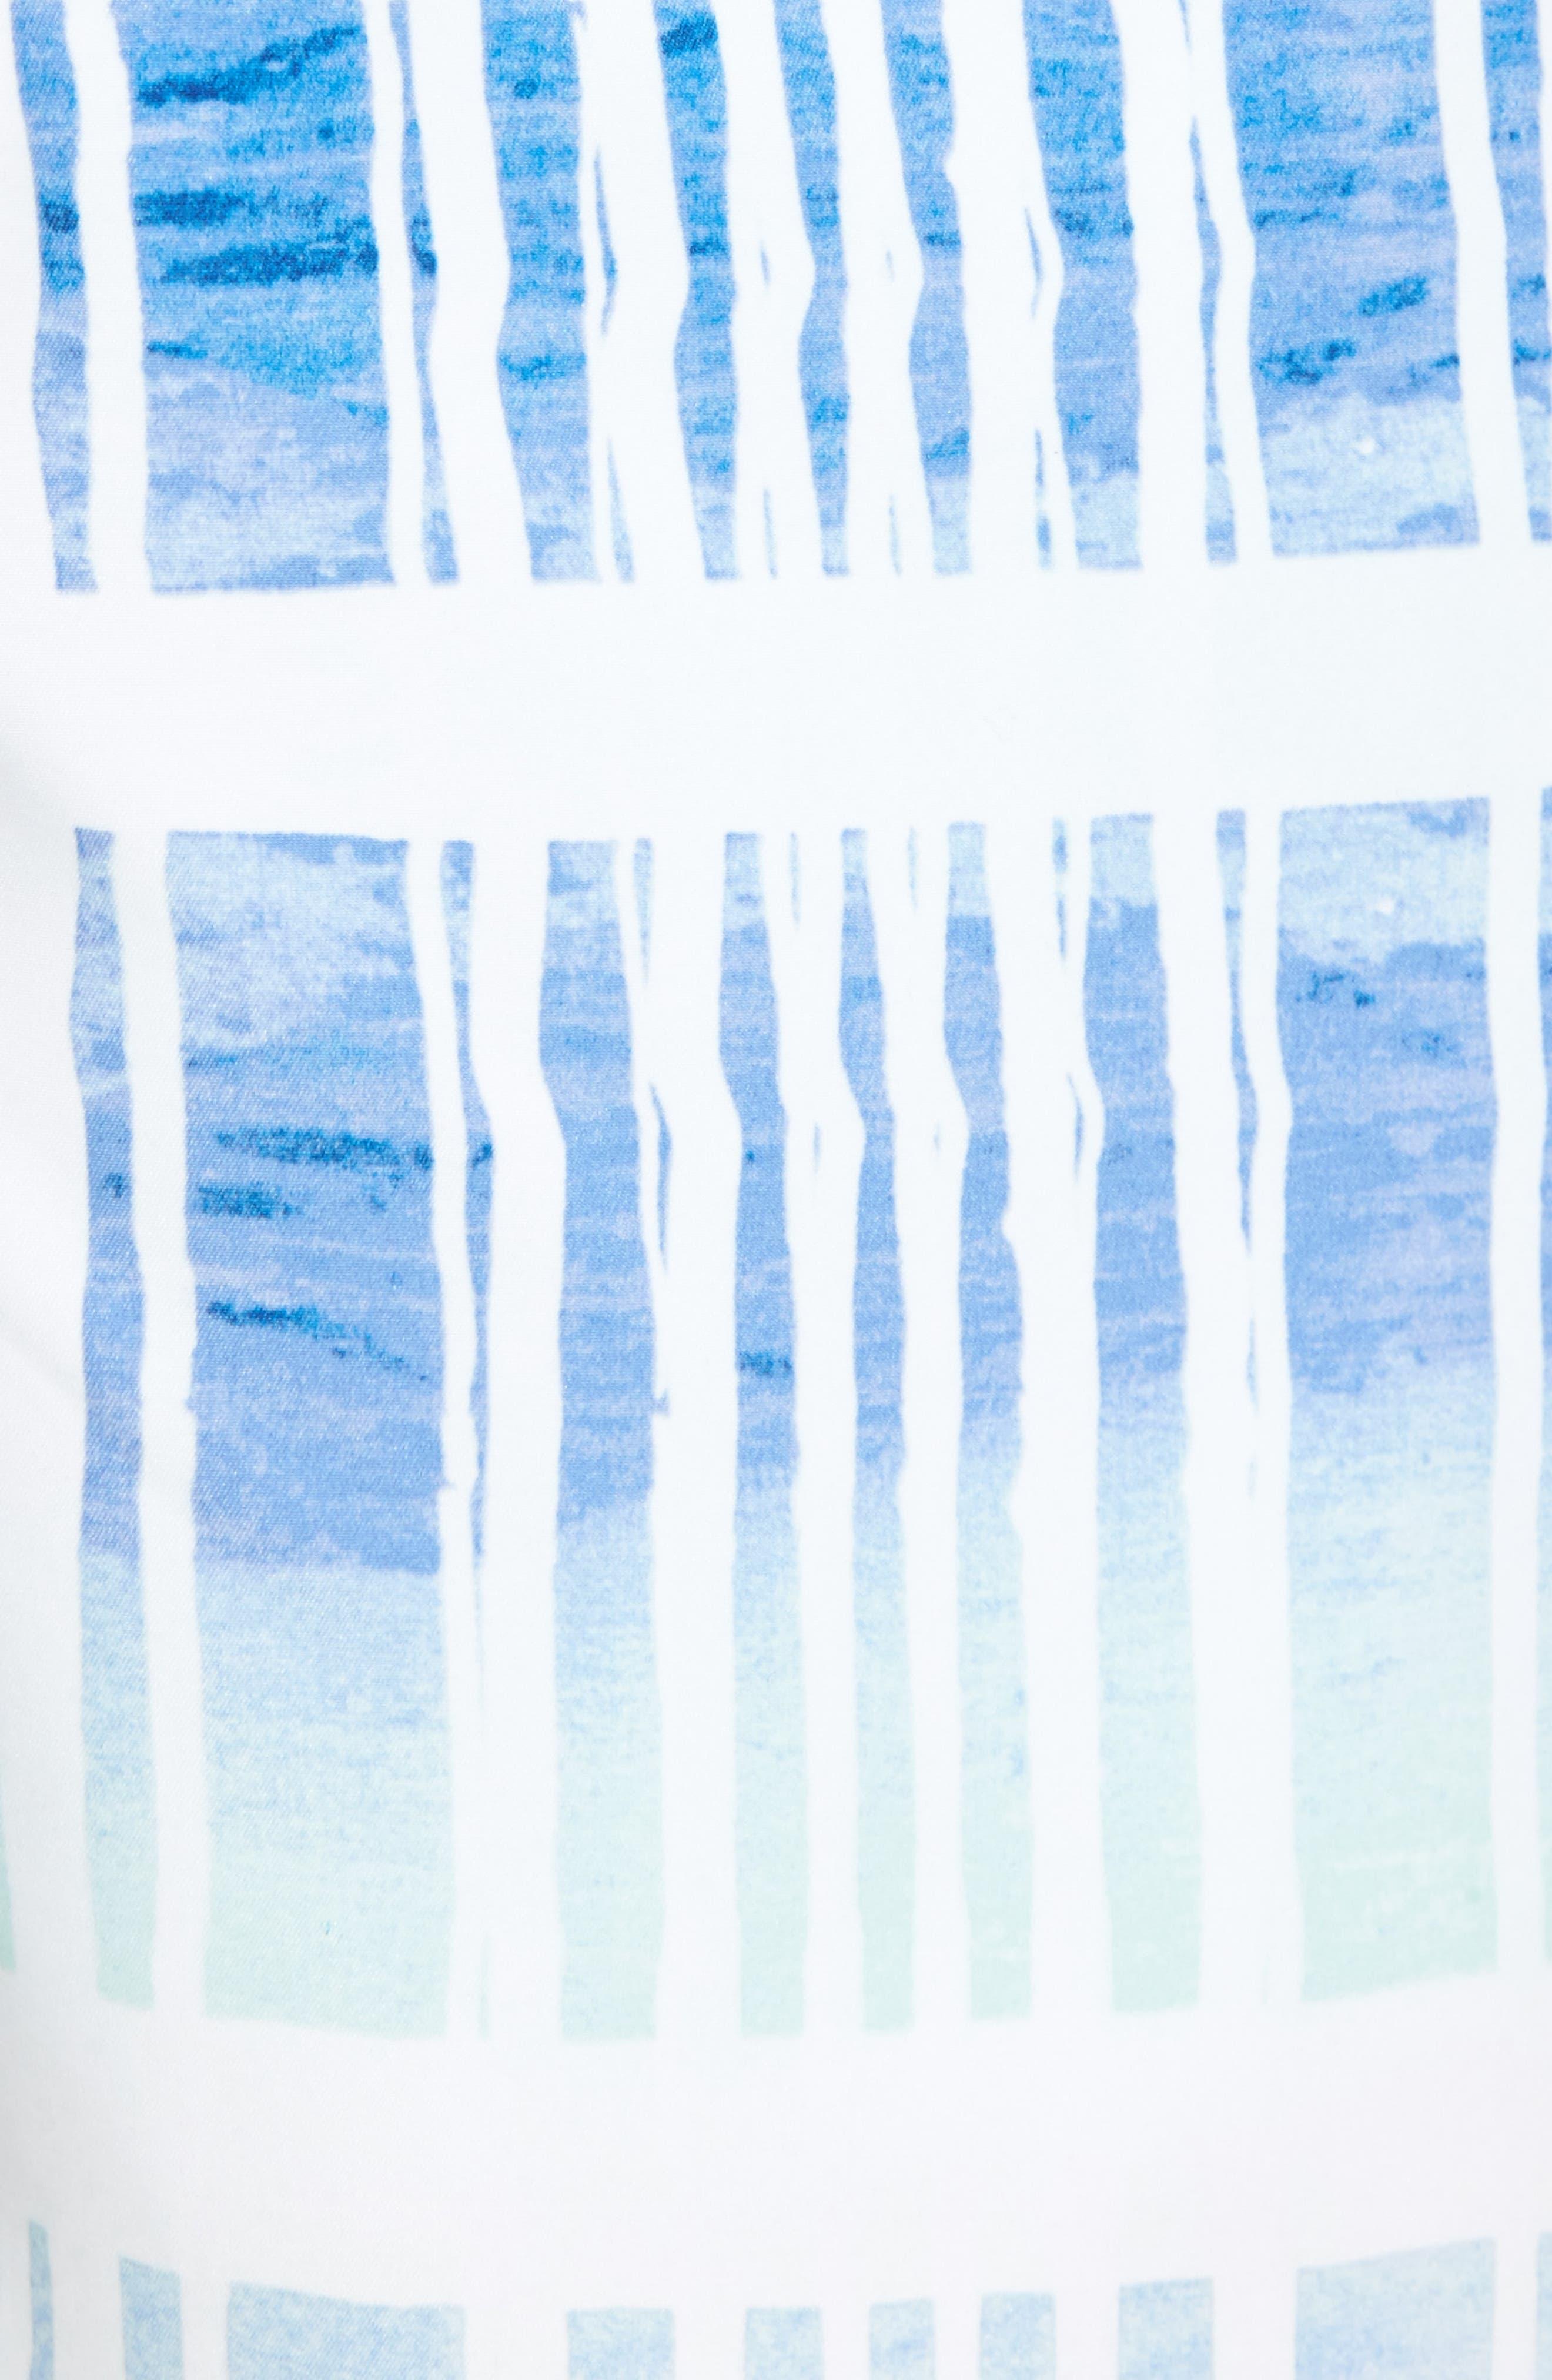 Baja Okeechobee Board Shorts,                             Alternate thumbnail 5, color,                             Santorini Blue